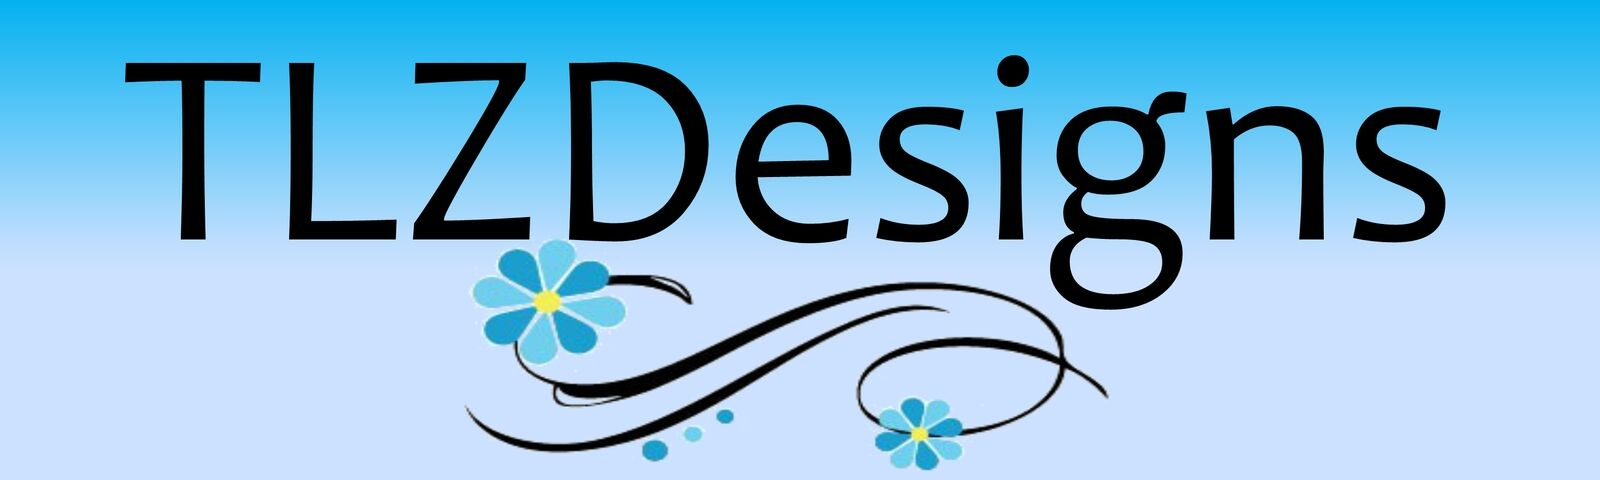 TLZ Designs